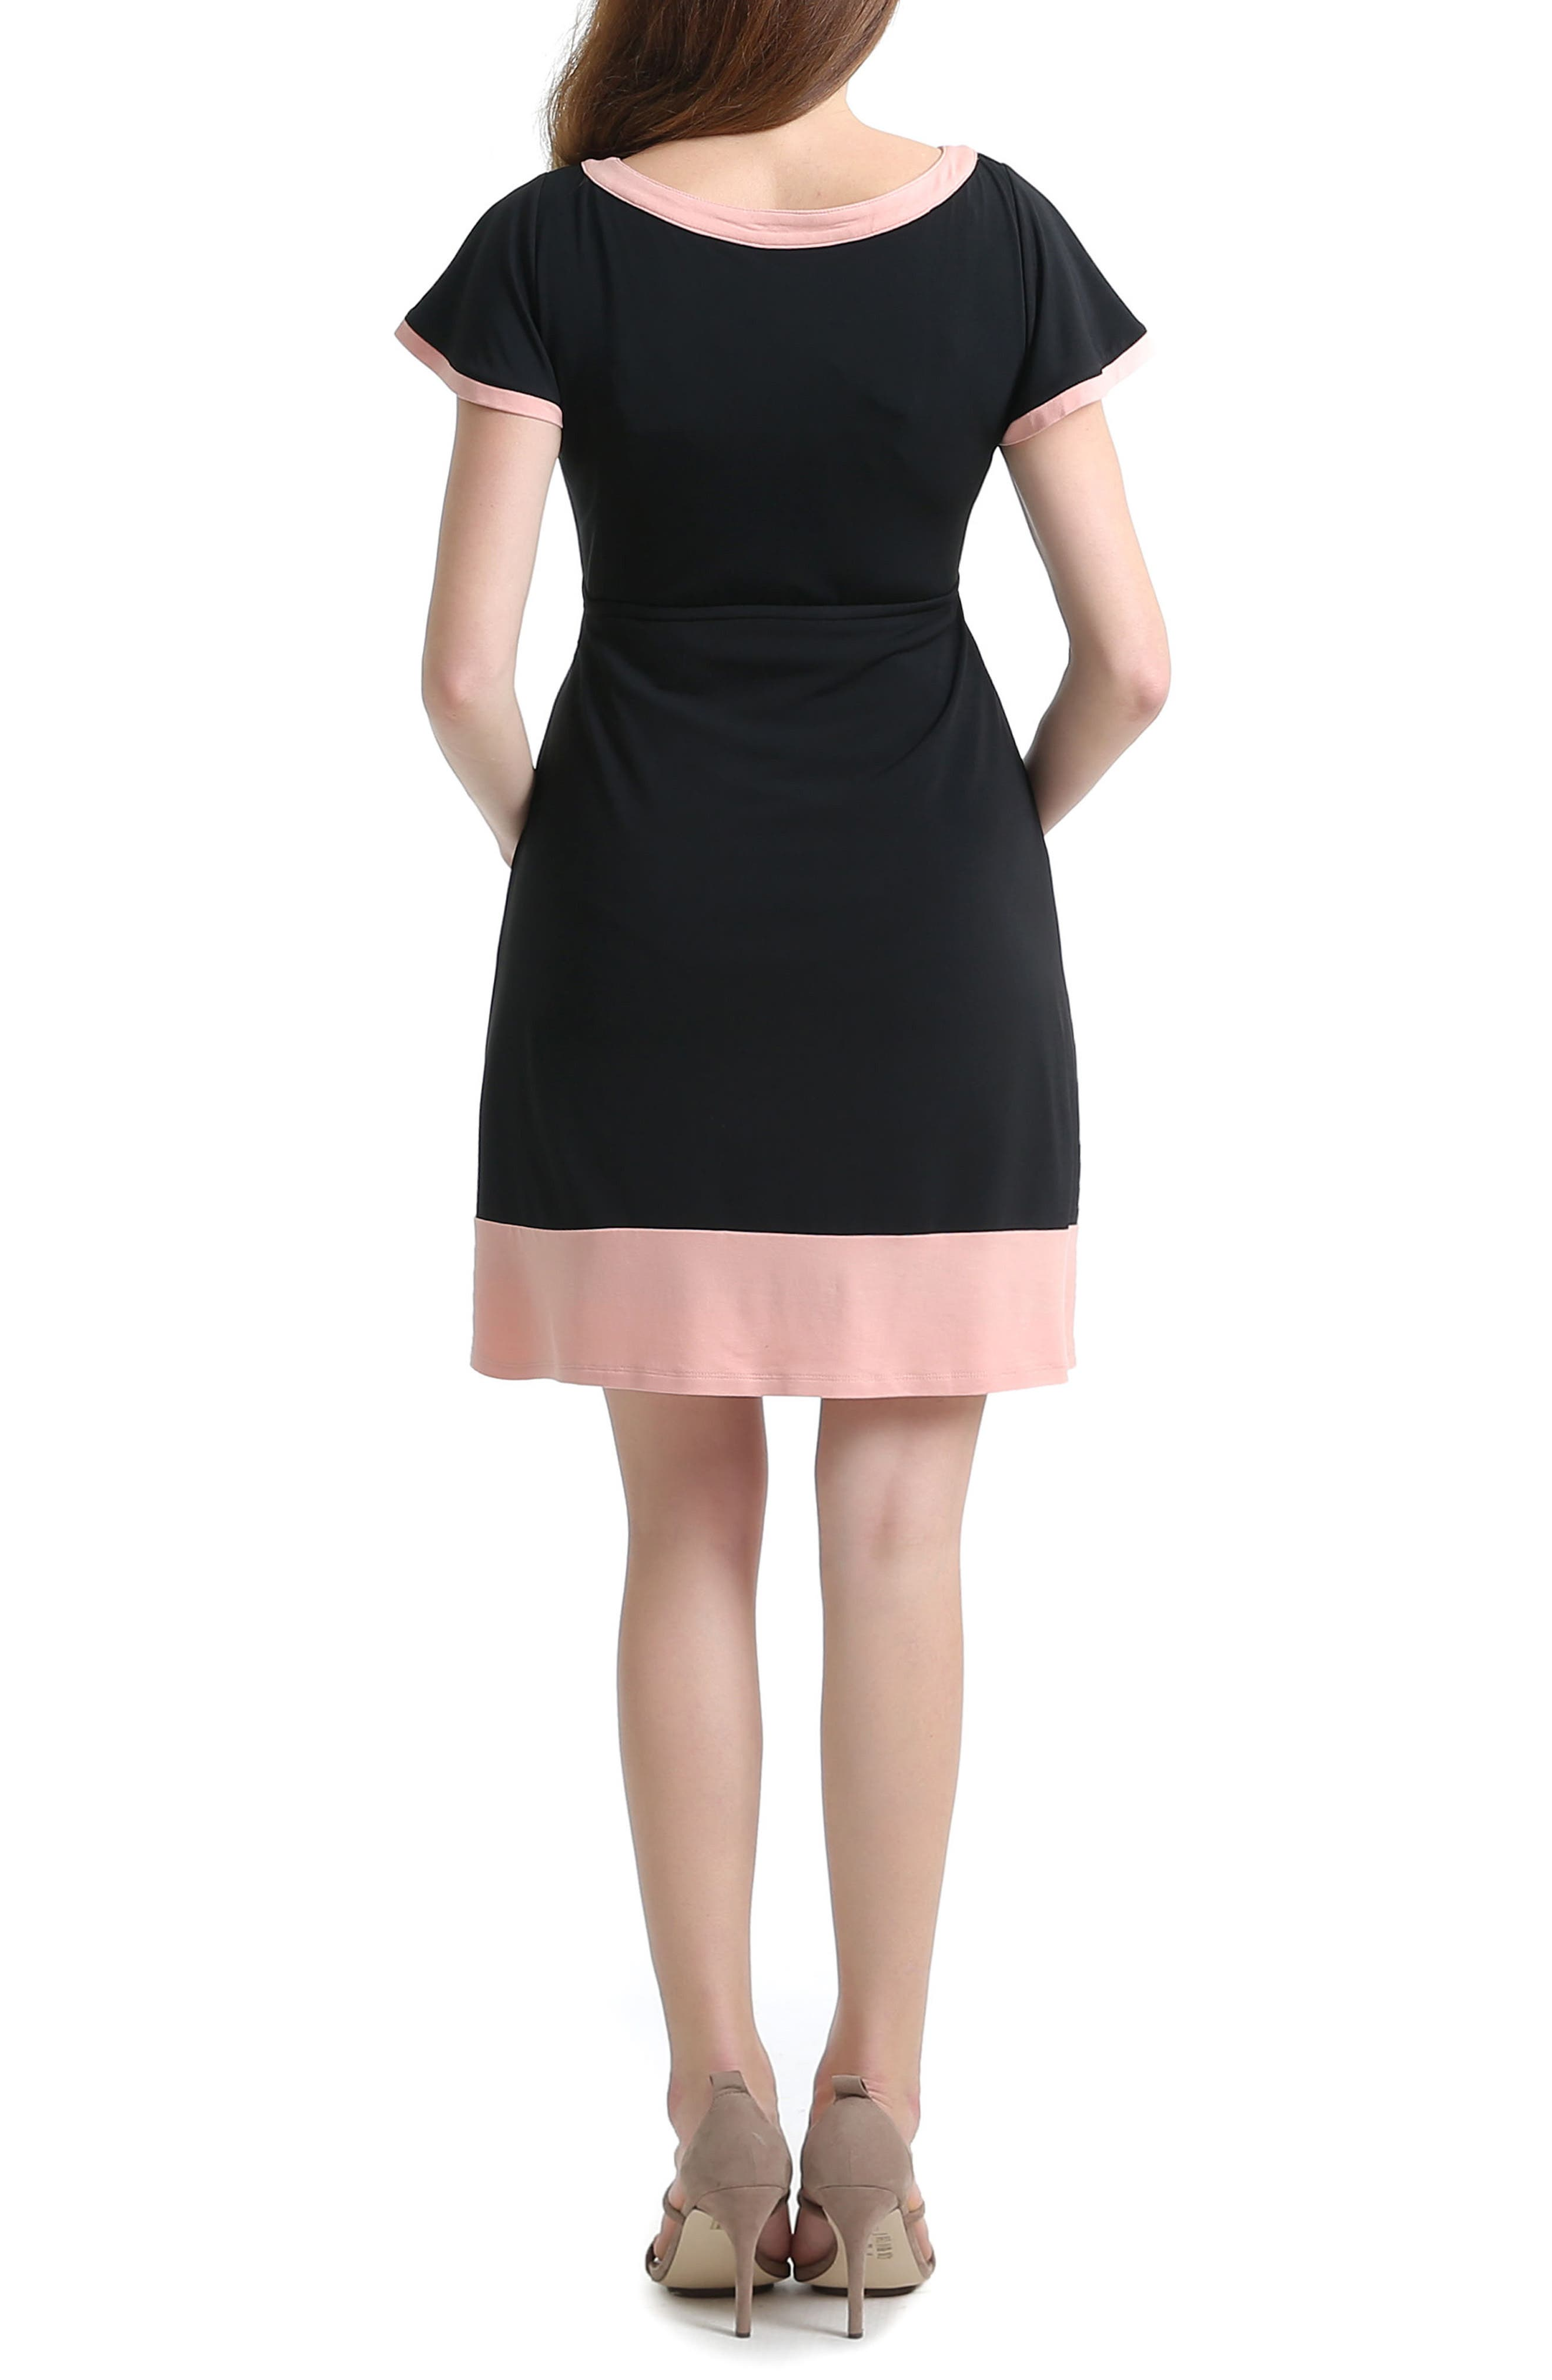 Regan Colorblock Skater Maternity Dress,                             Alternate thumbnail 2, color,                             BLACK